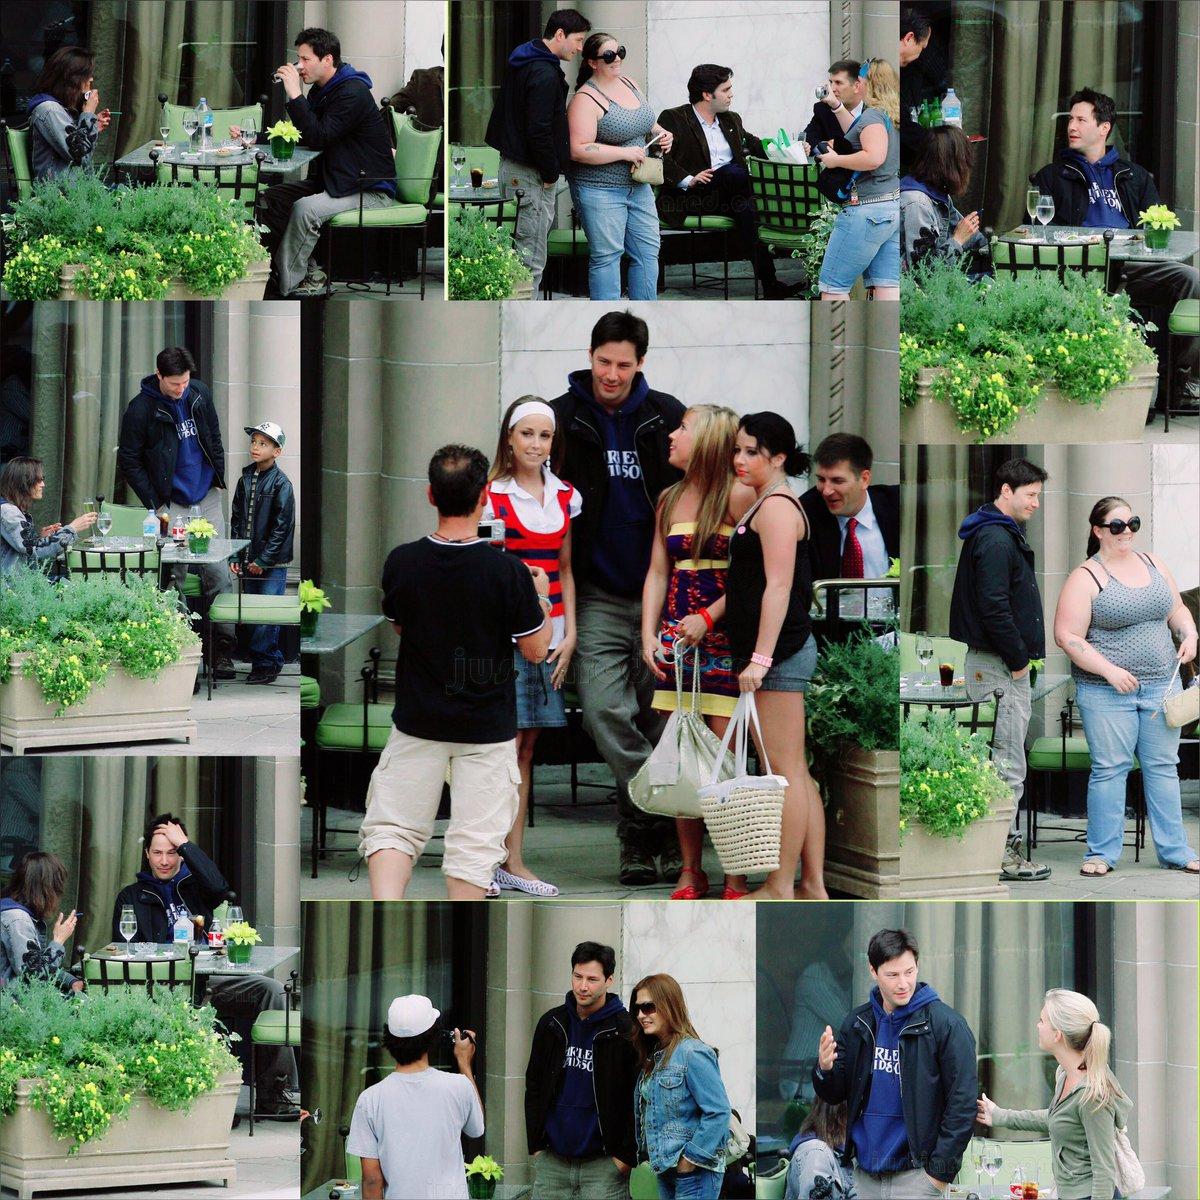 Keanu with fans  7 JUNE 2007 . . . #keanureeves #keanureevesedit #keanureevesfans #keanureevesofficial #keanureevesfan #keanu #fans #fan #movie #film #actor #thematrixmoviepic.twitter.com/nkm4dUKyfS